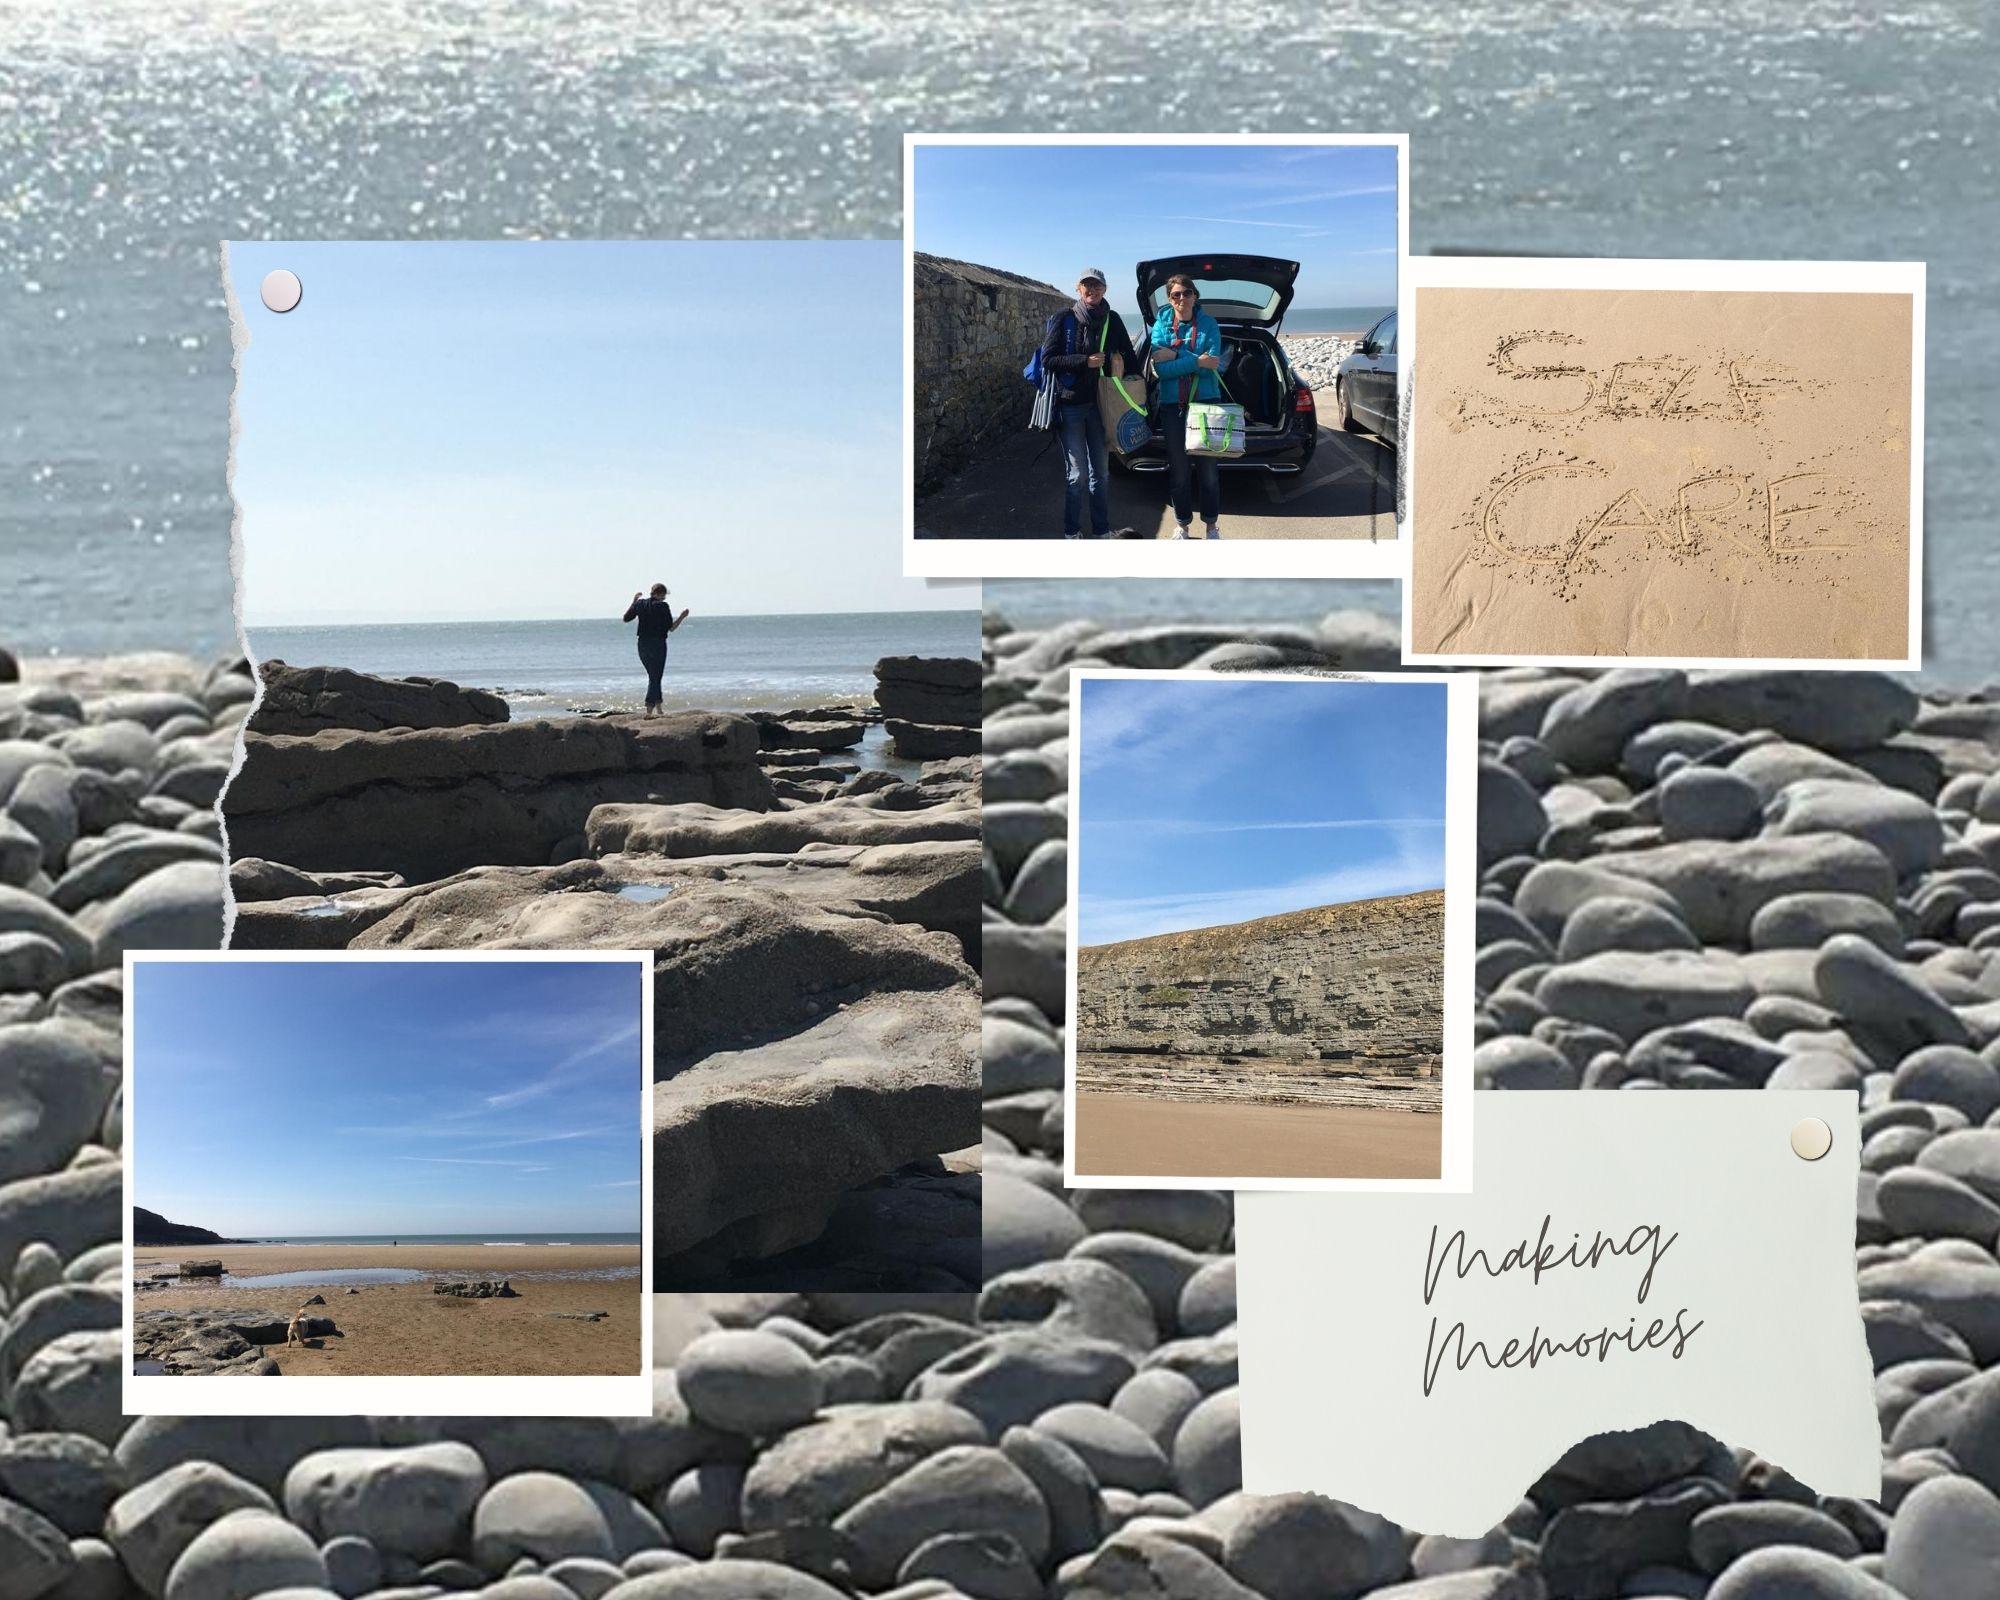 self care, selfcare, beach, sea, ocean, friends, relax, sand, memories